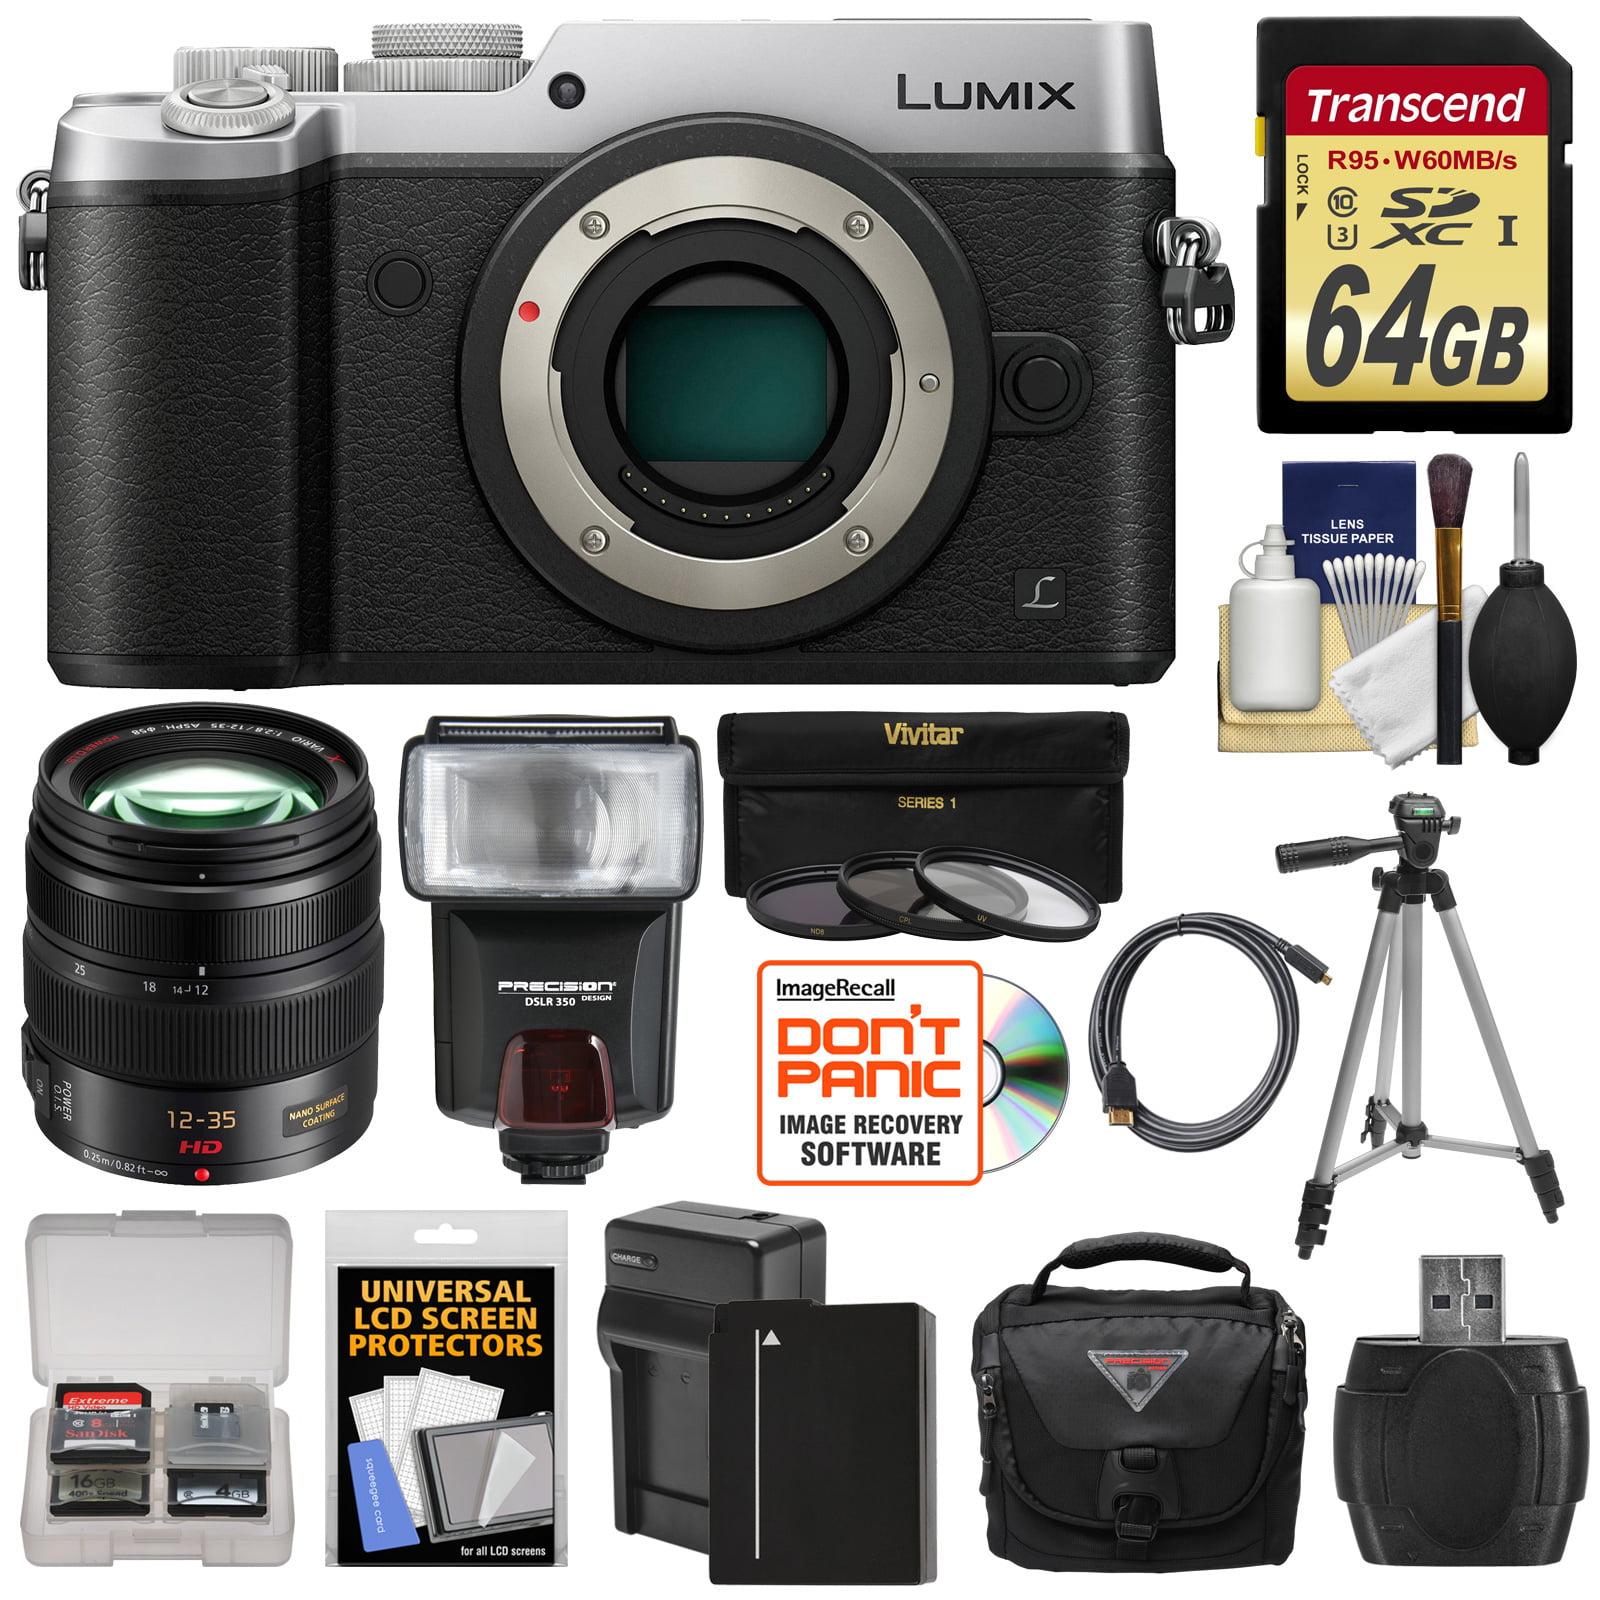 Panasonic Lumix DMC-GX8 4K Wi-Fi Digital Camera Body (Silver) with 12-35mm f 2.8 OIS Lens + 64GB Card +... by Panasonic